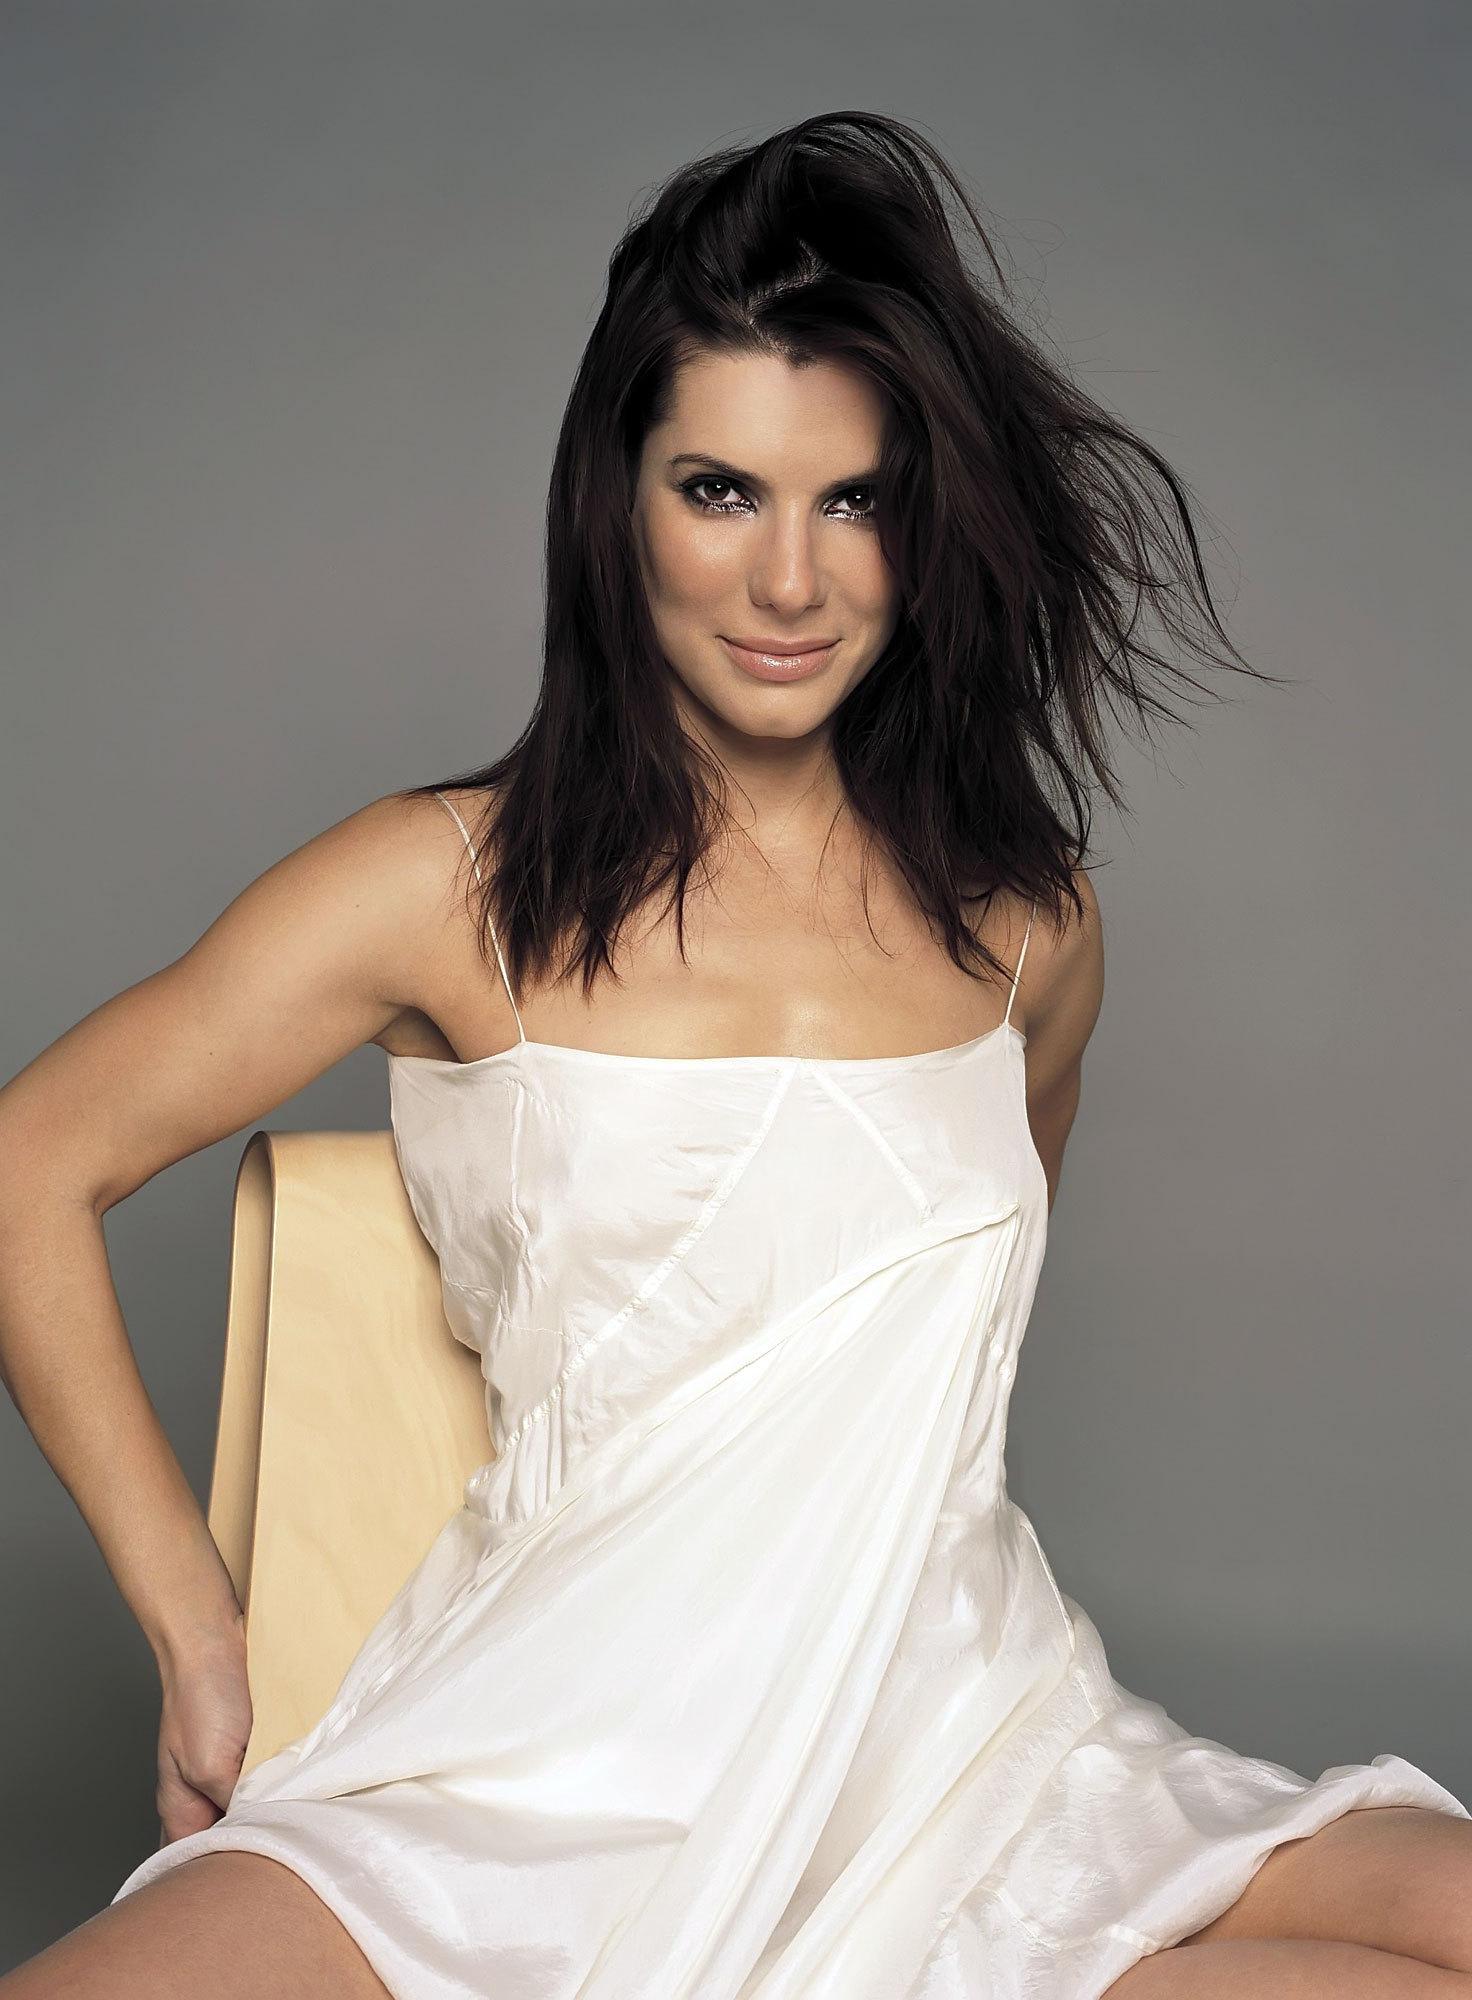 Sandra-Bullock-Pictures